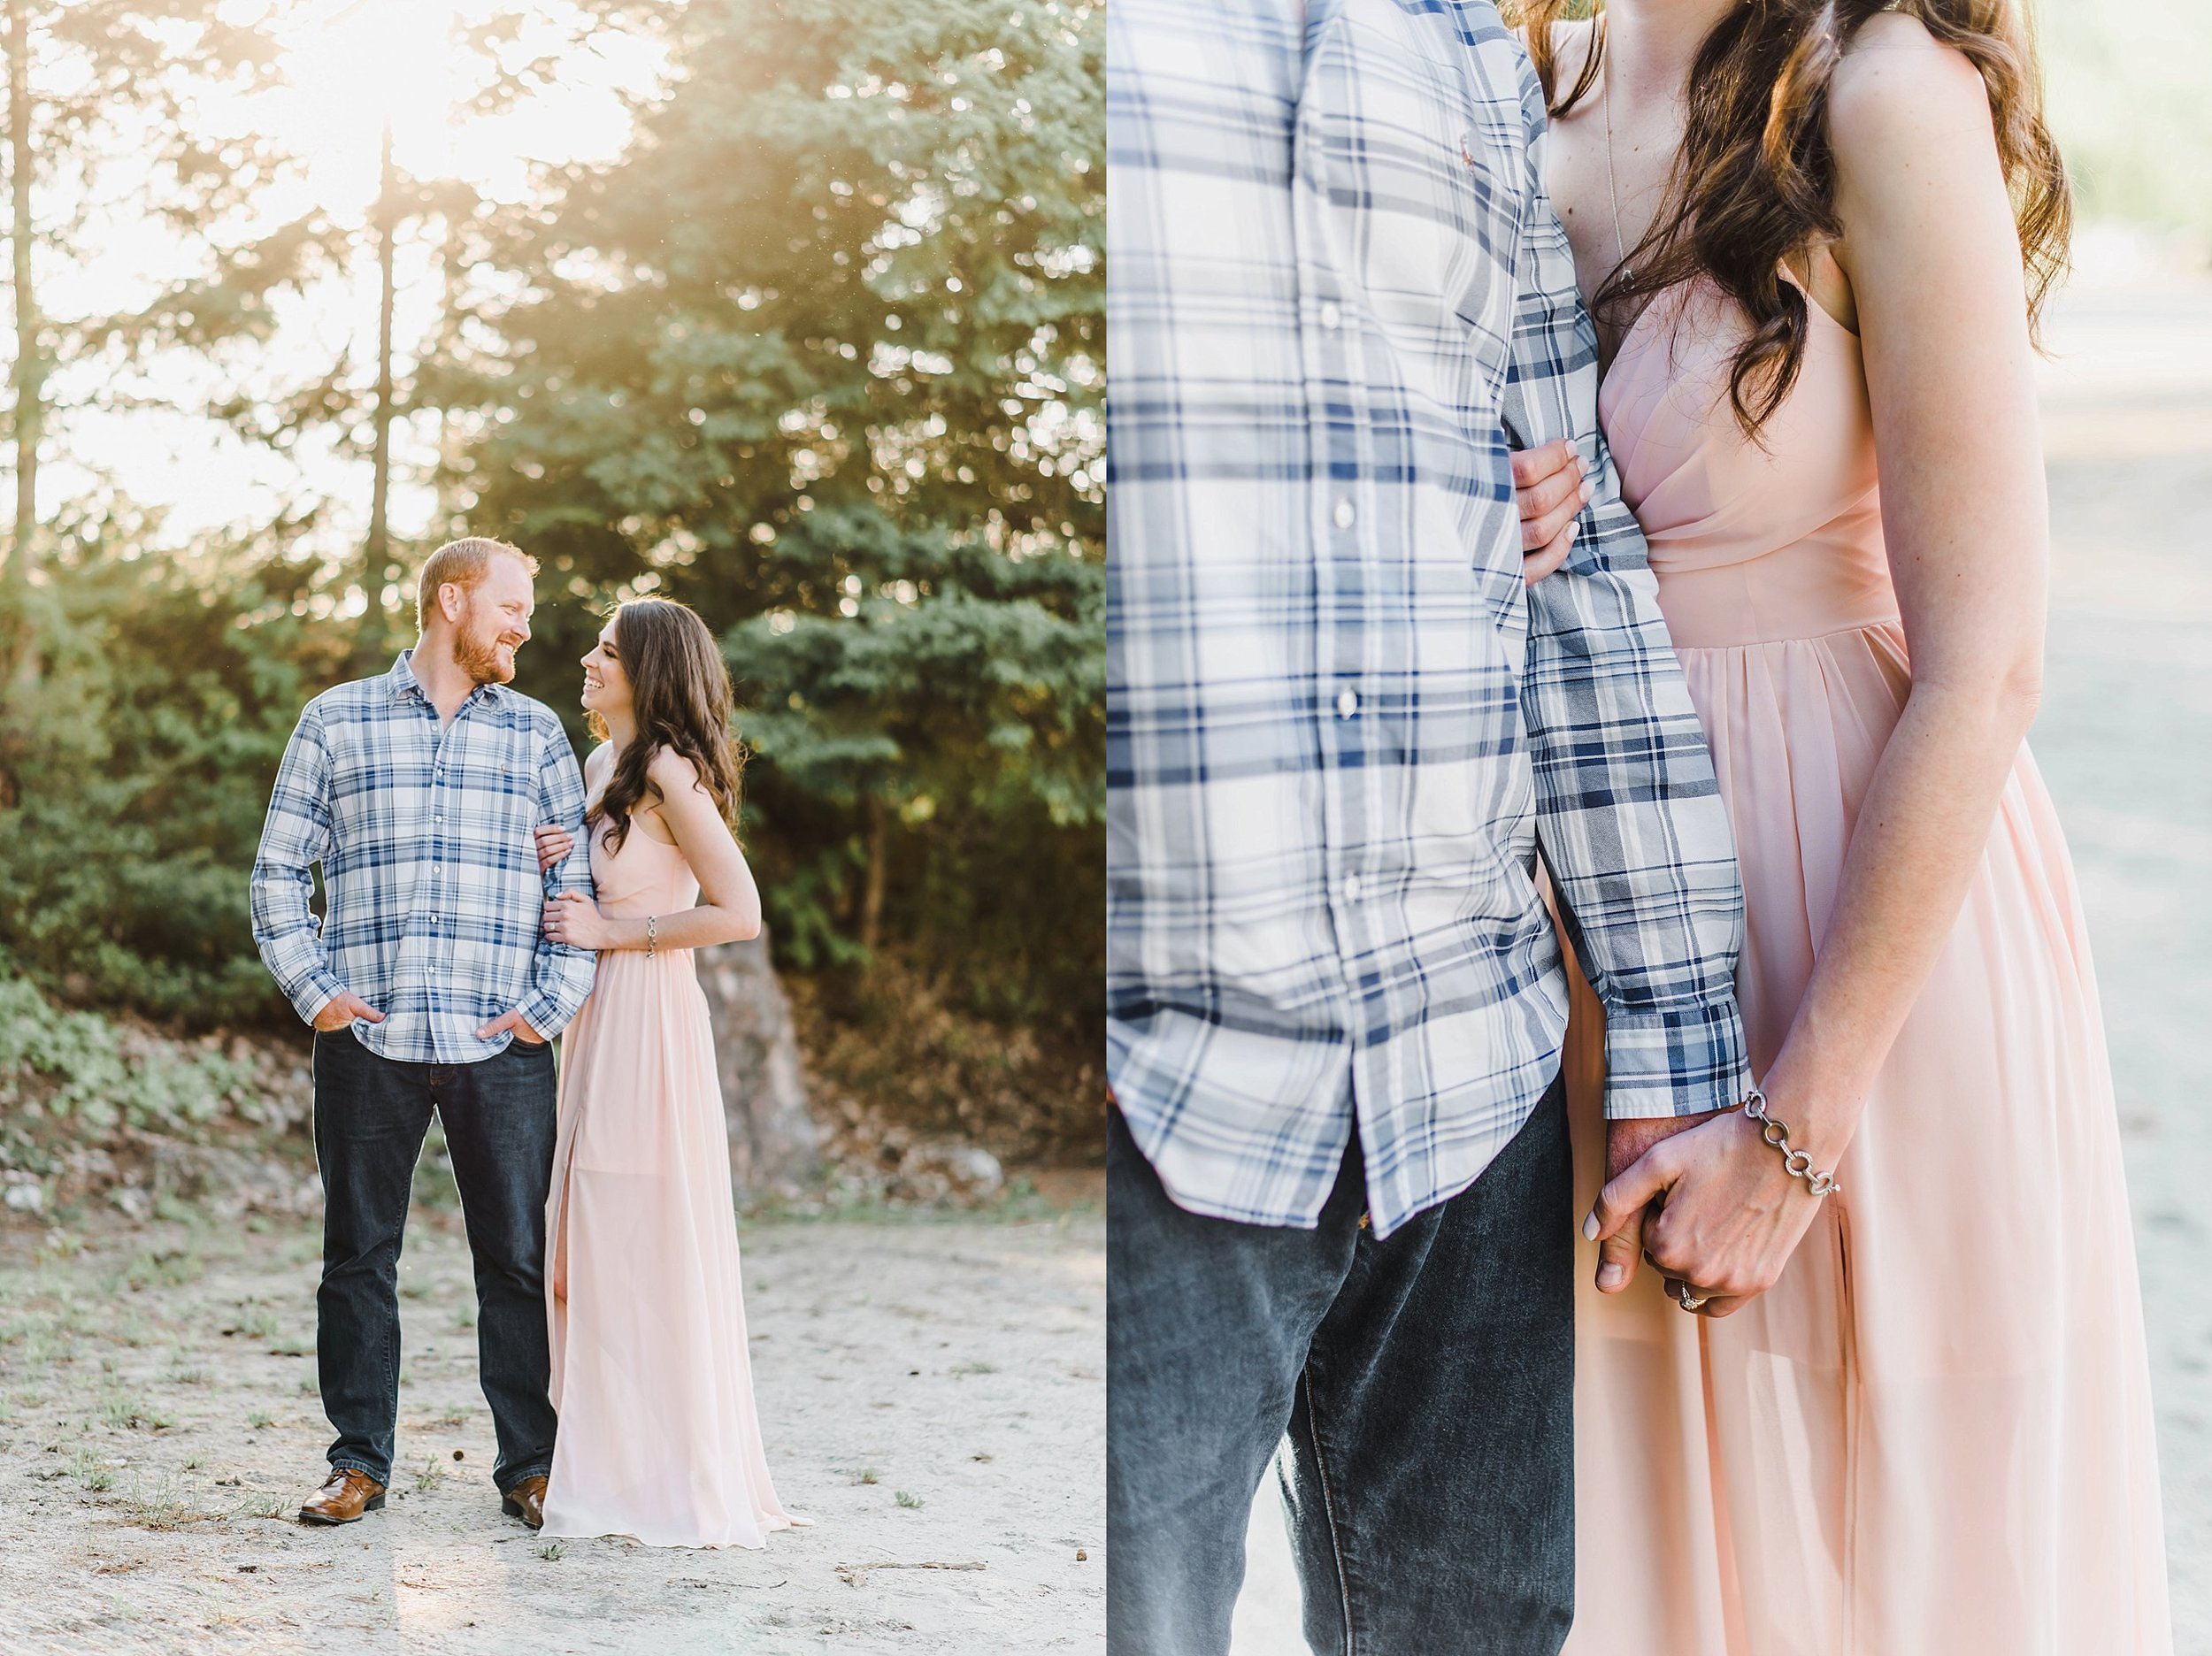 light airy indie fine art ottawa wedding photographer | Ali and Batoul Photography_0664.jpg